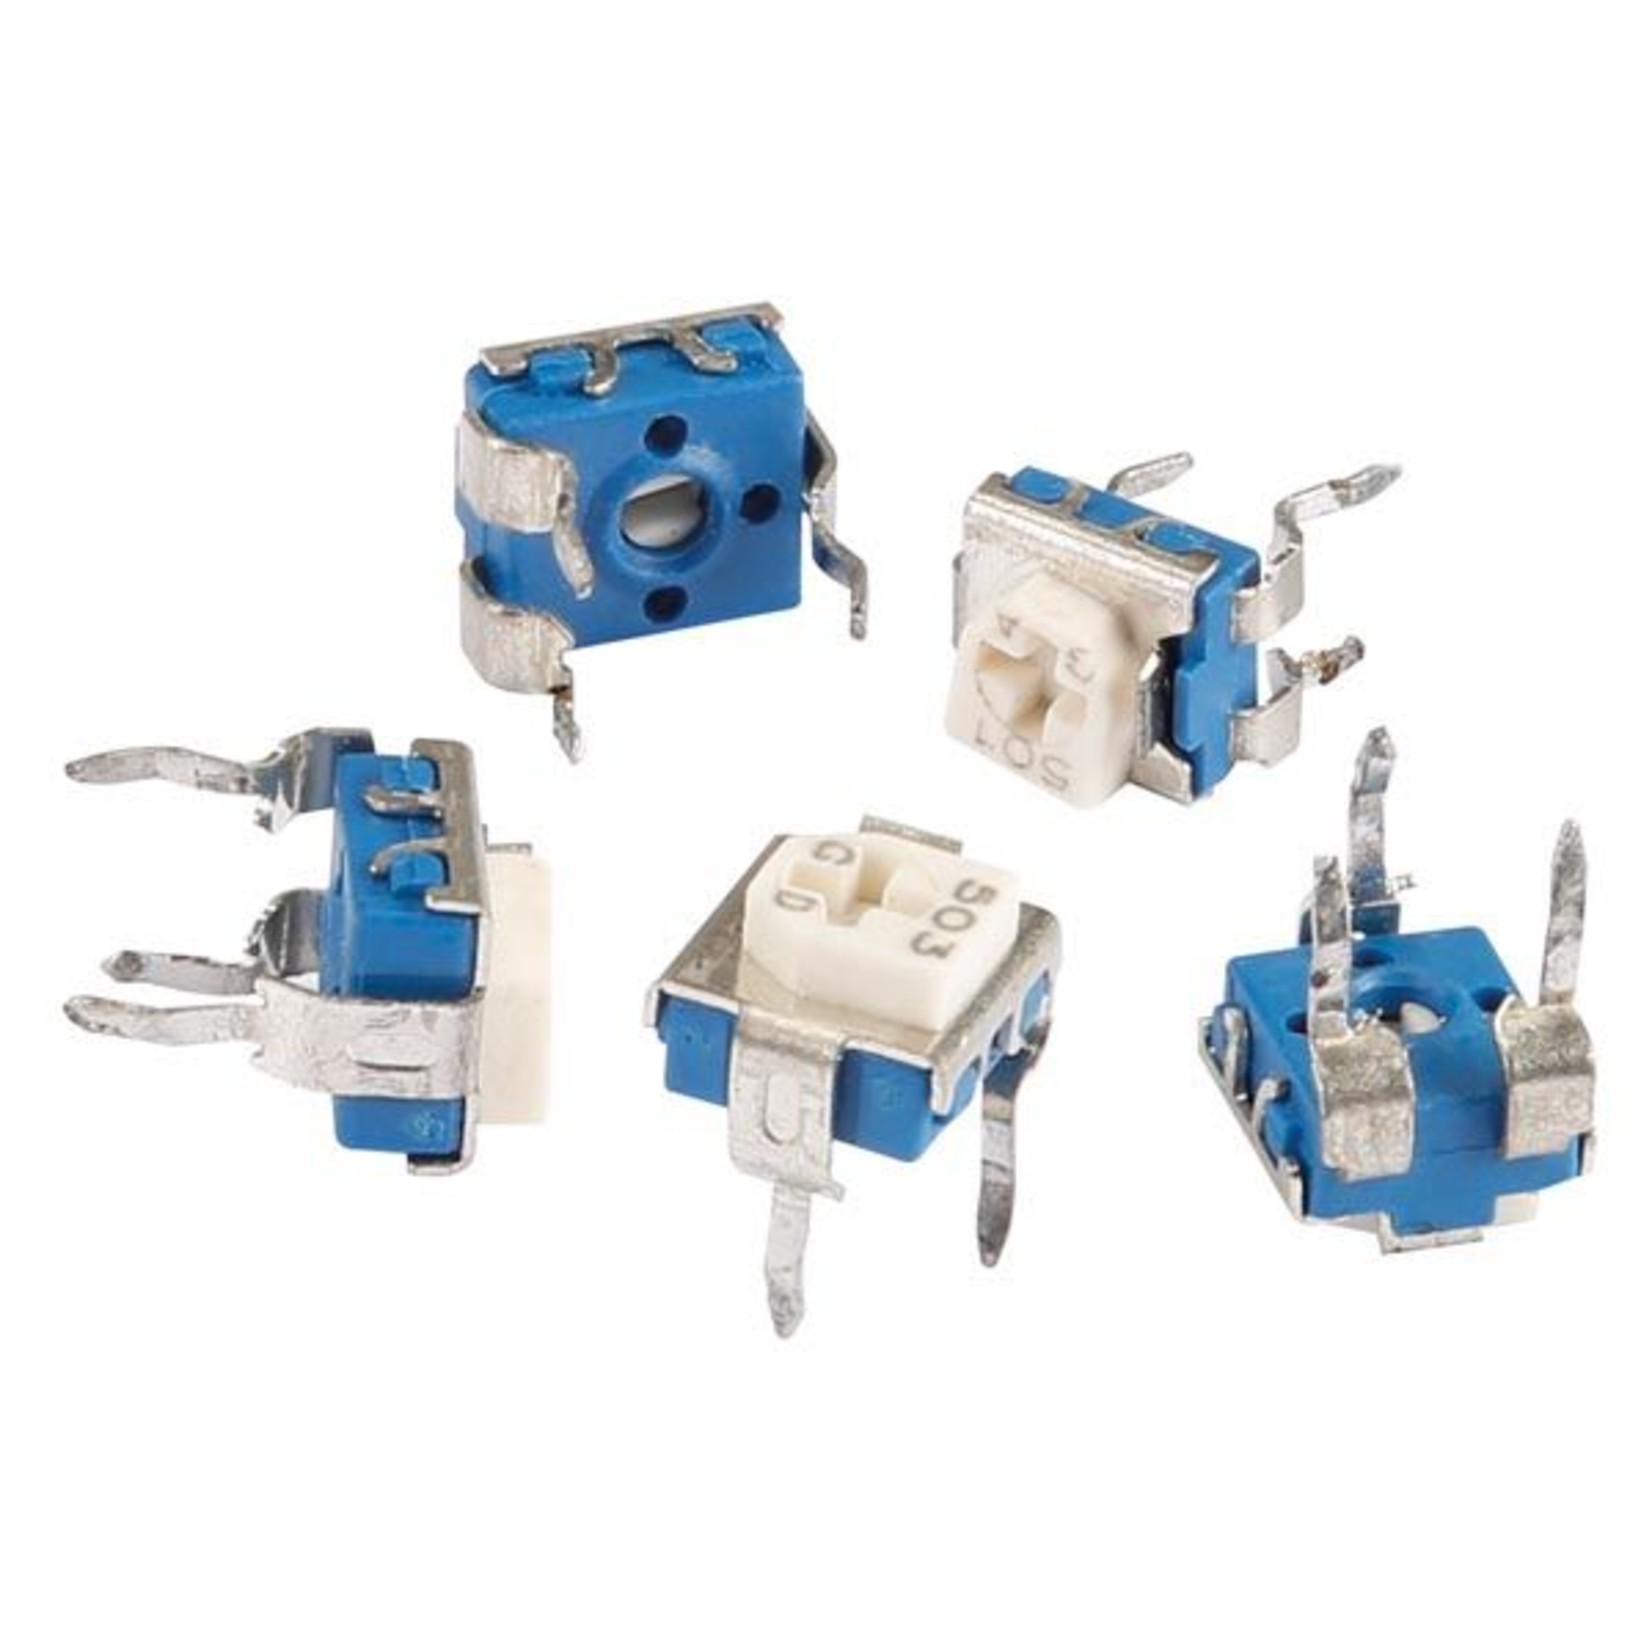 Set met trimpotentiometers